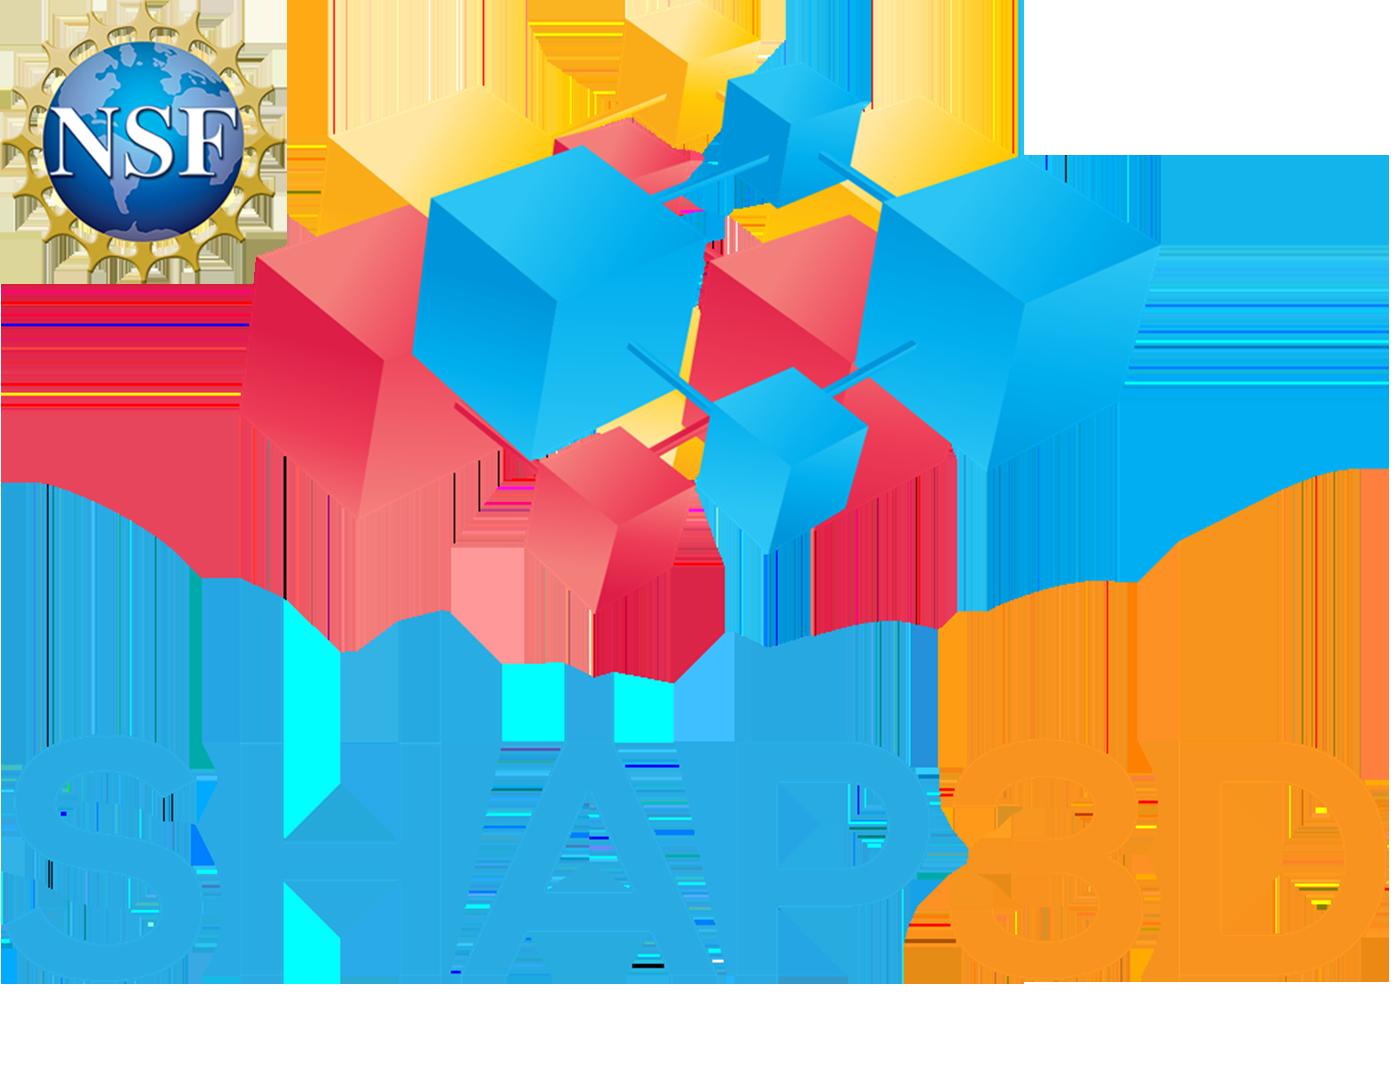 Integrity joins Shap3d